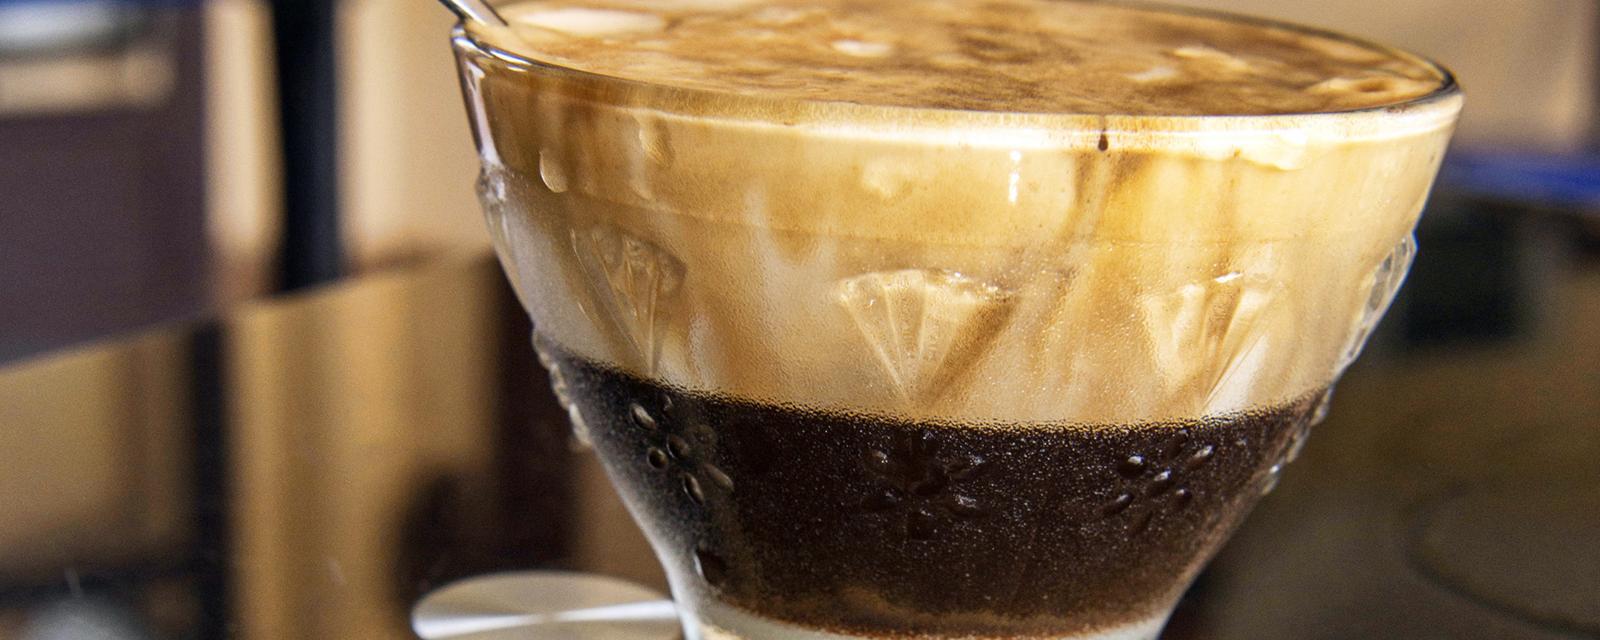 Fine weasel coffee, civet, Vietnam (Credit: Credit: age fotostock/Alamy)